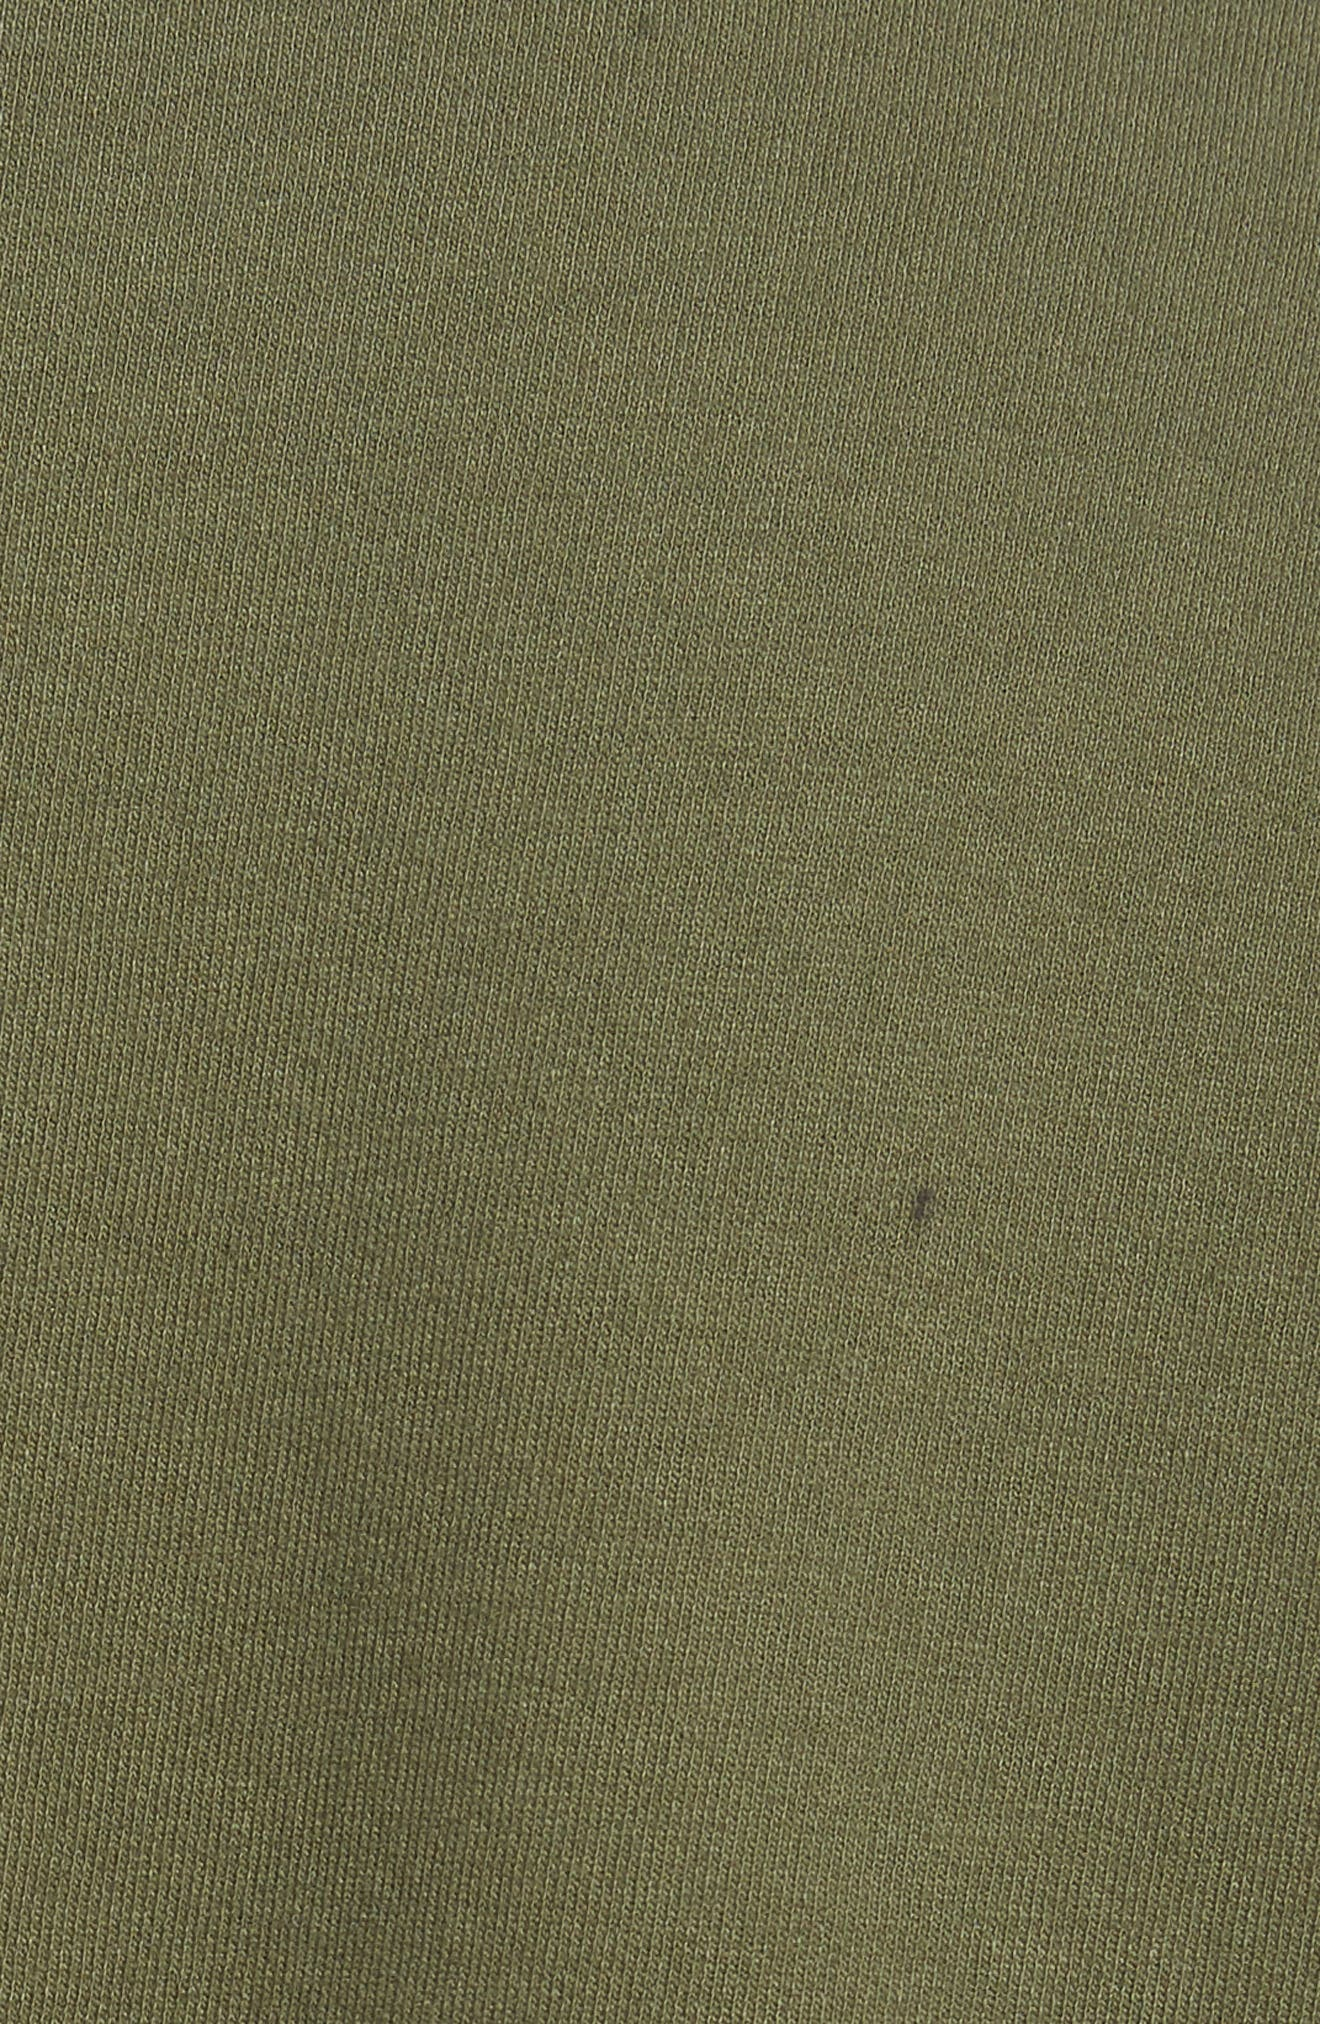 Alternate Image 5  - The Rail Splice Sweatshirt